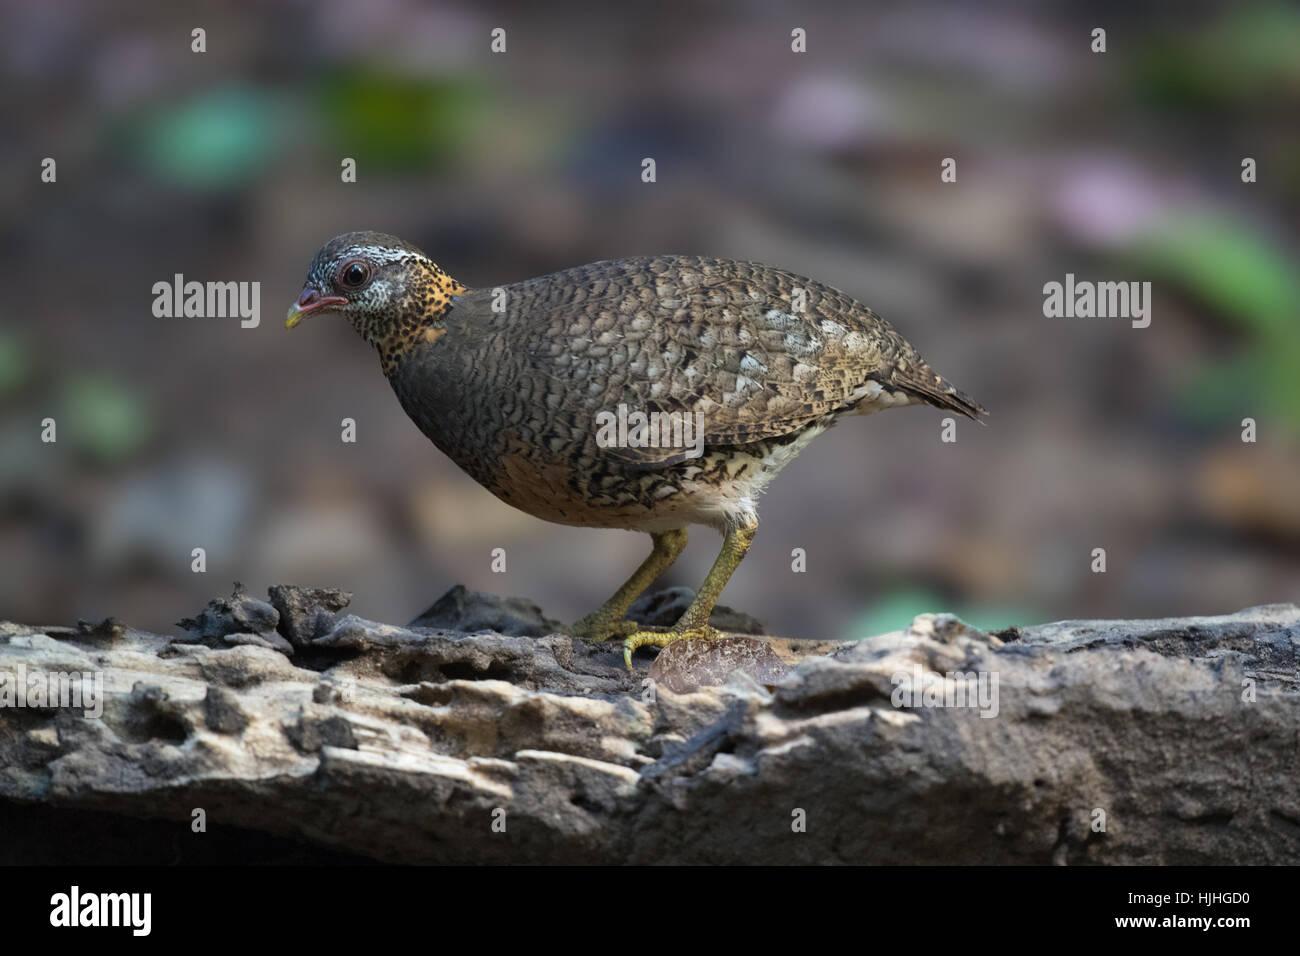 Scaly-breasted Partridge, Arborophila chloropus peninsularis, at Kaeng Krachan National Park, Thailand. - Stock Image